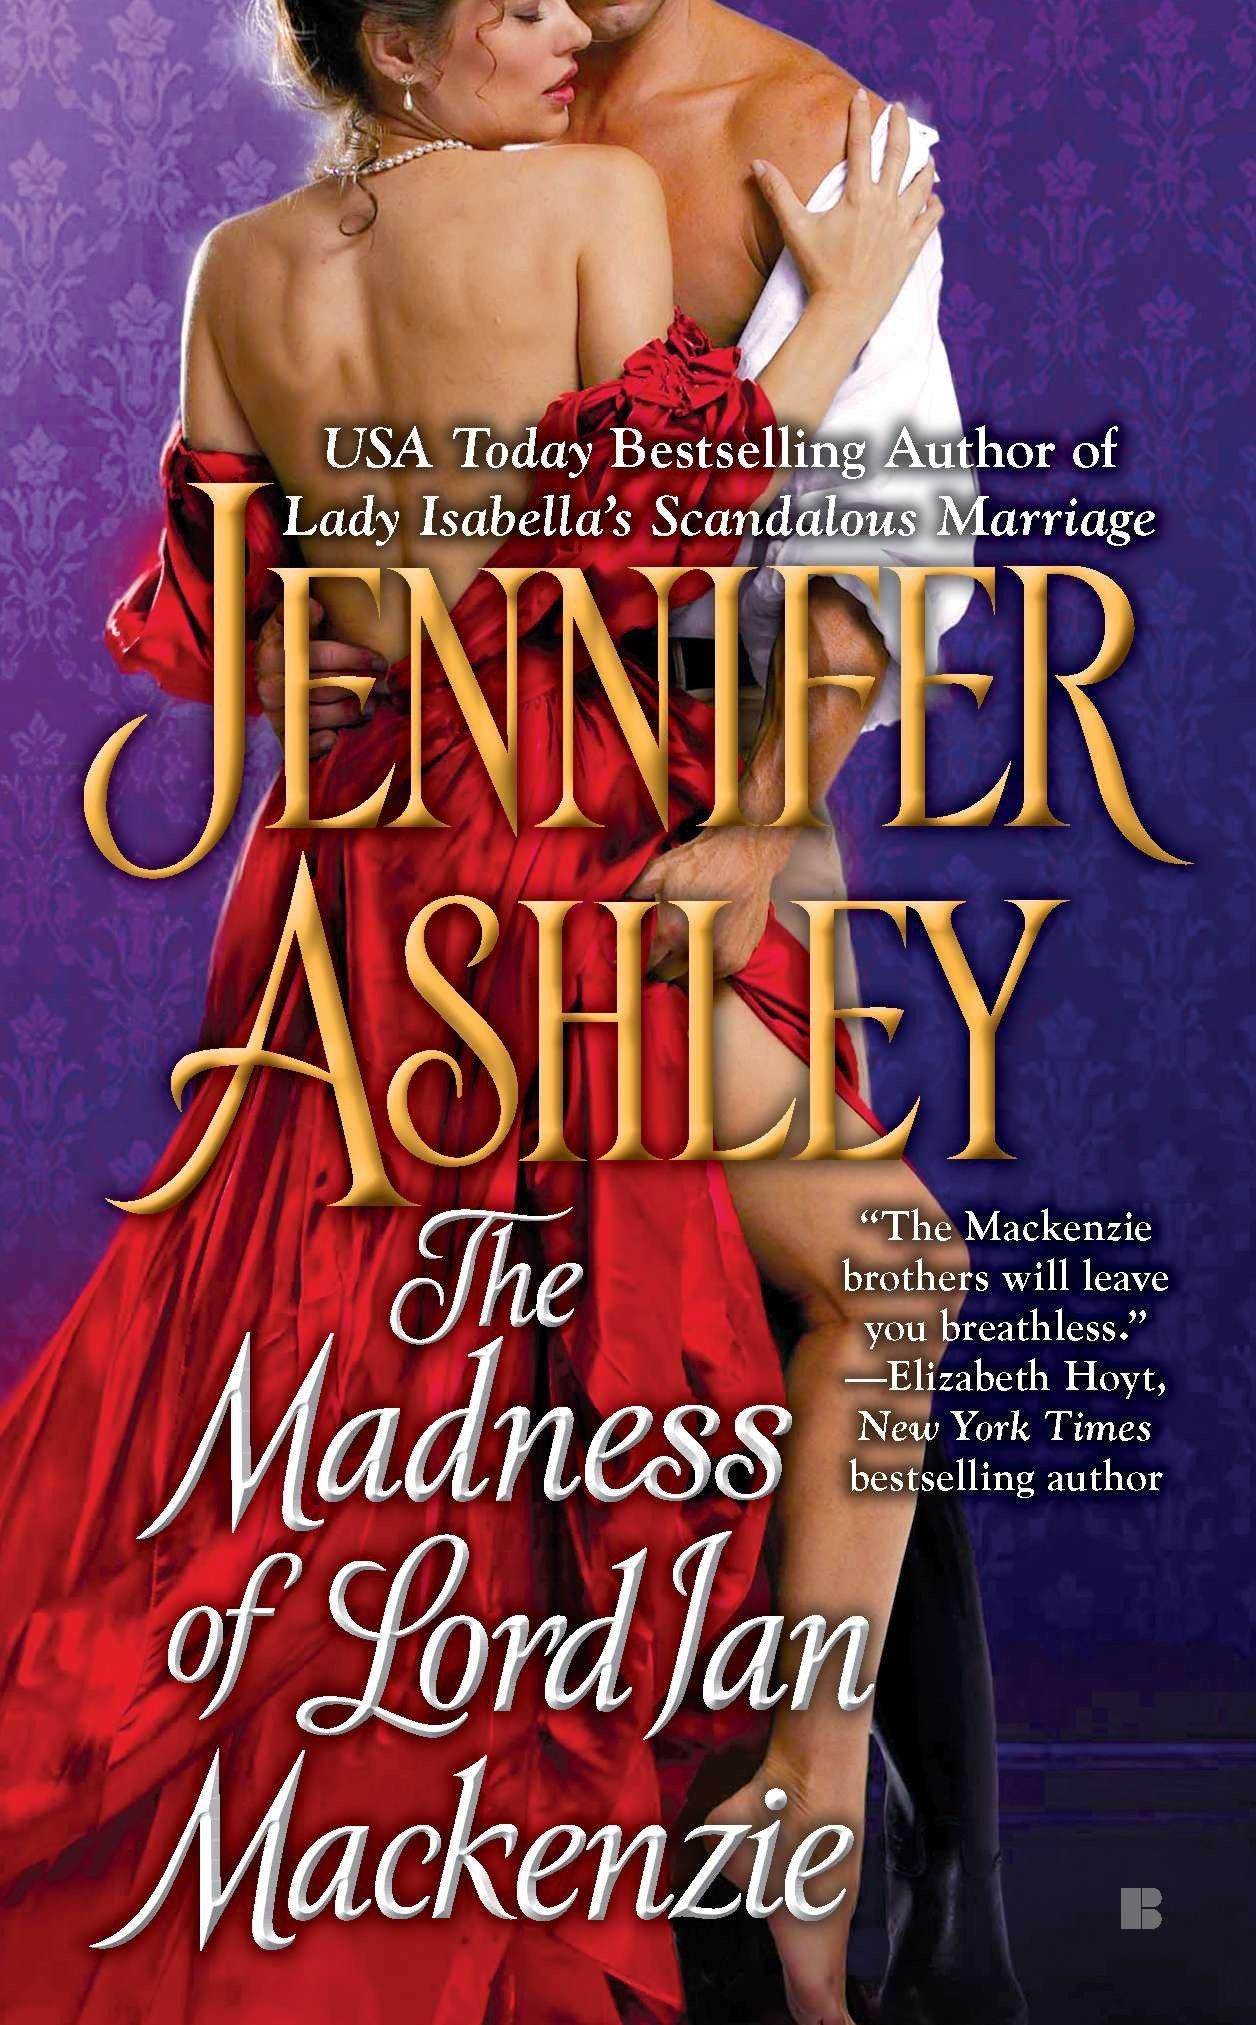 The Madness of Lord Ian Mackenzie (Mackenzies Series): Ashley, Jennifer:  9780425244470: Amazon.com: Books